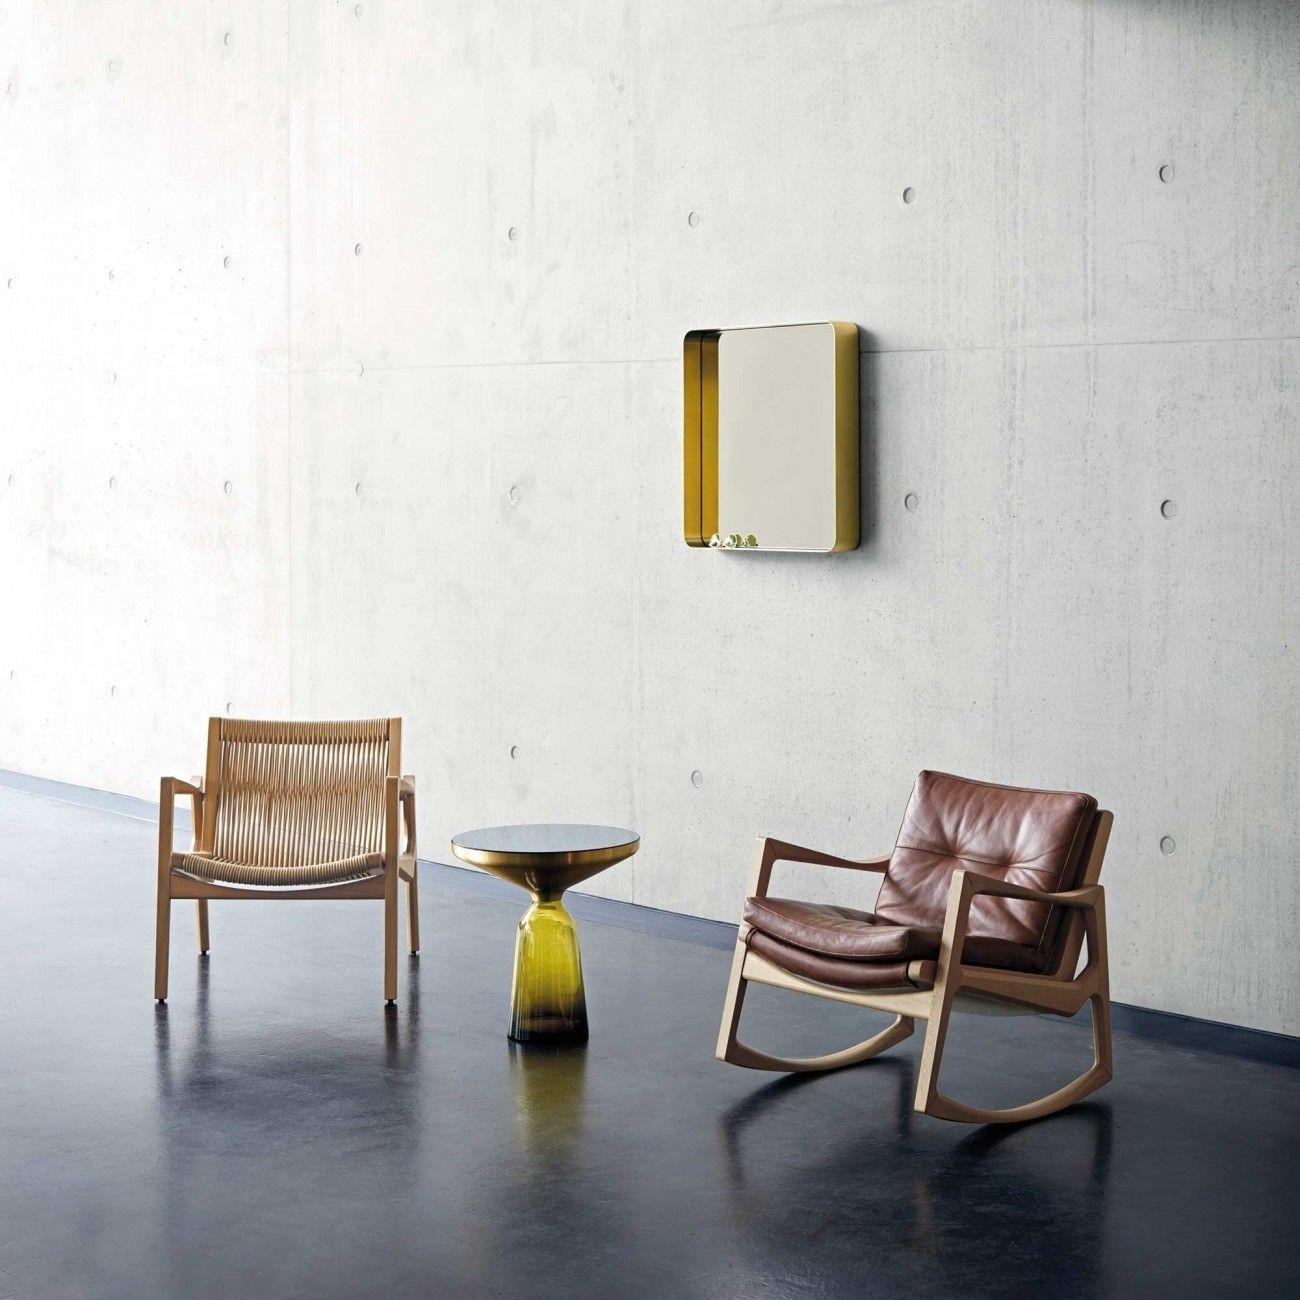 Euvira Rocking Chair   Furniture   Pinterest   Rocking chairs and ...